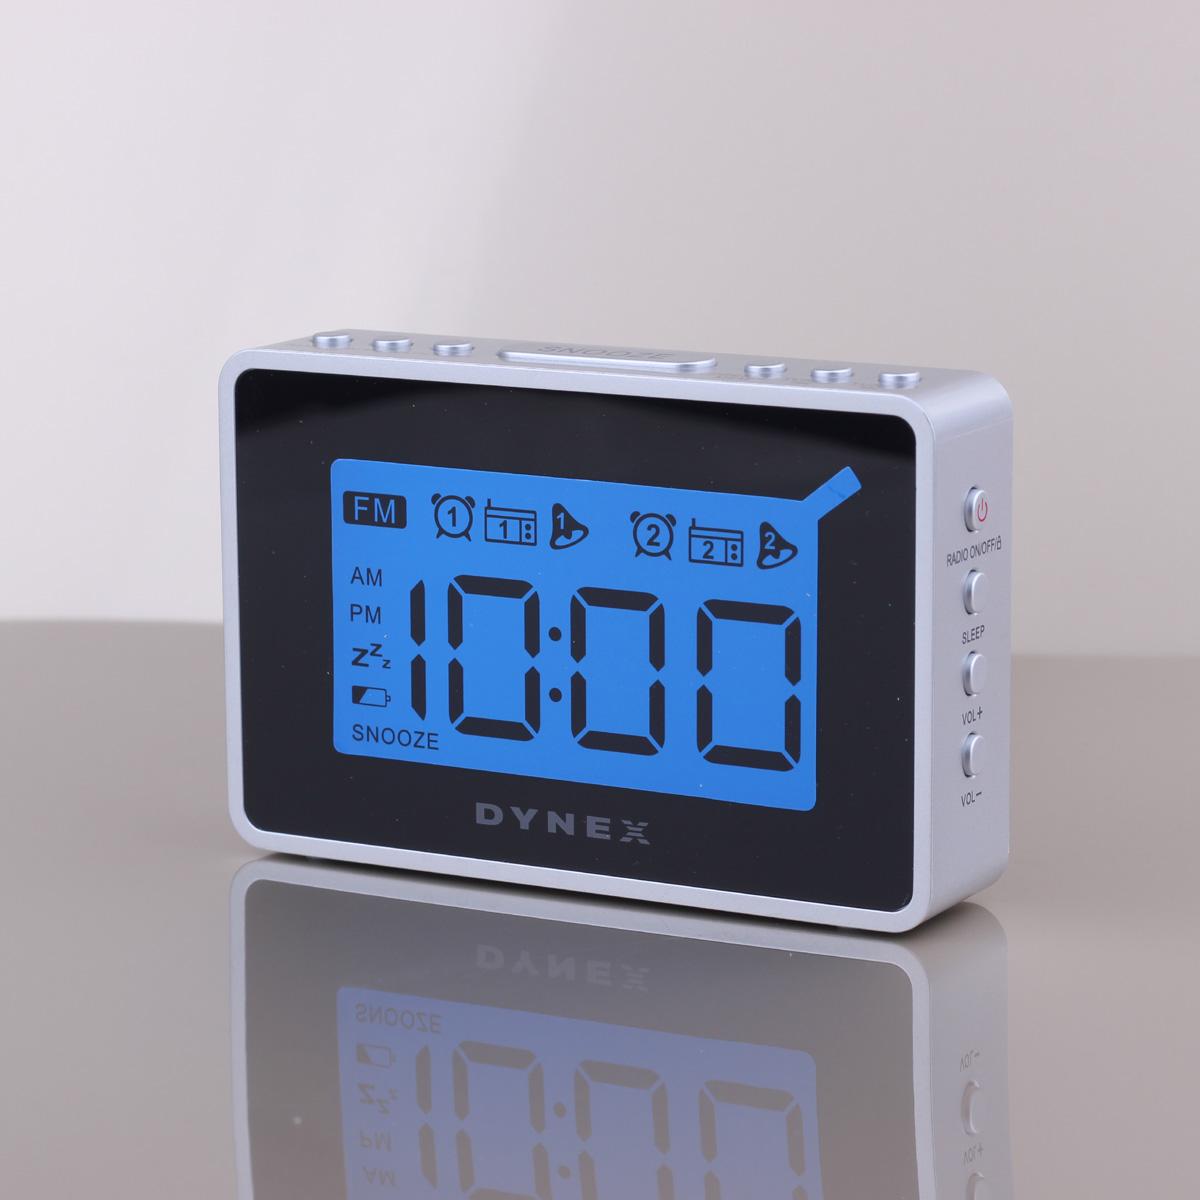 buy led digital alarm clock radio with. Black Bedroom Furniture Sets. Home Design Ideas